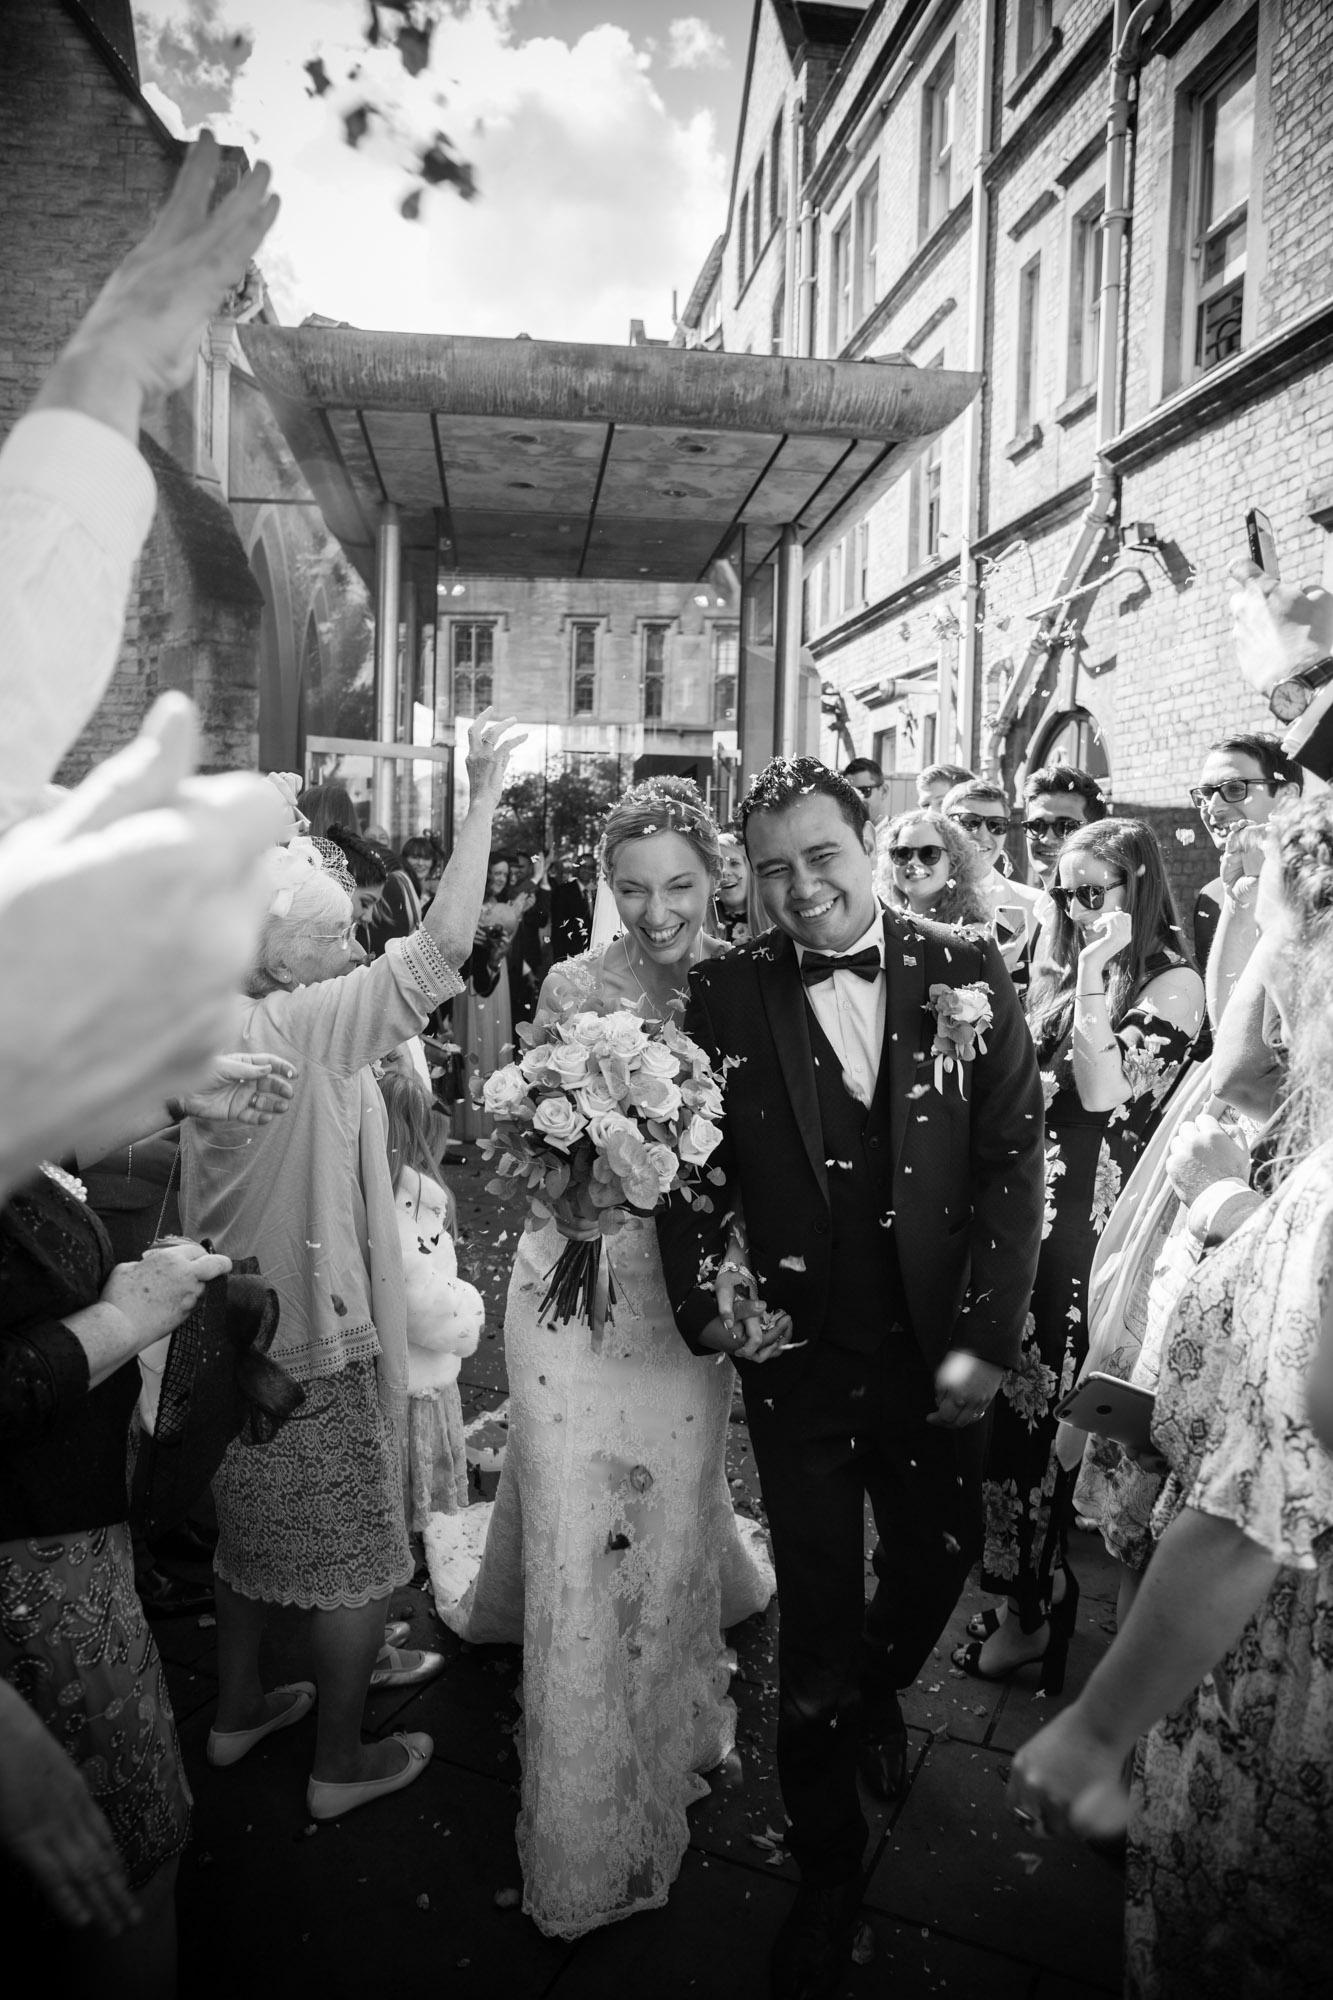 weddings-couples-love-photographer-oxford-london-jonathan-self-photography-45.jpg